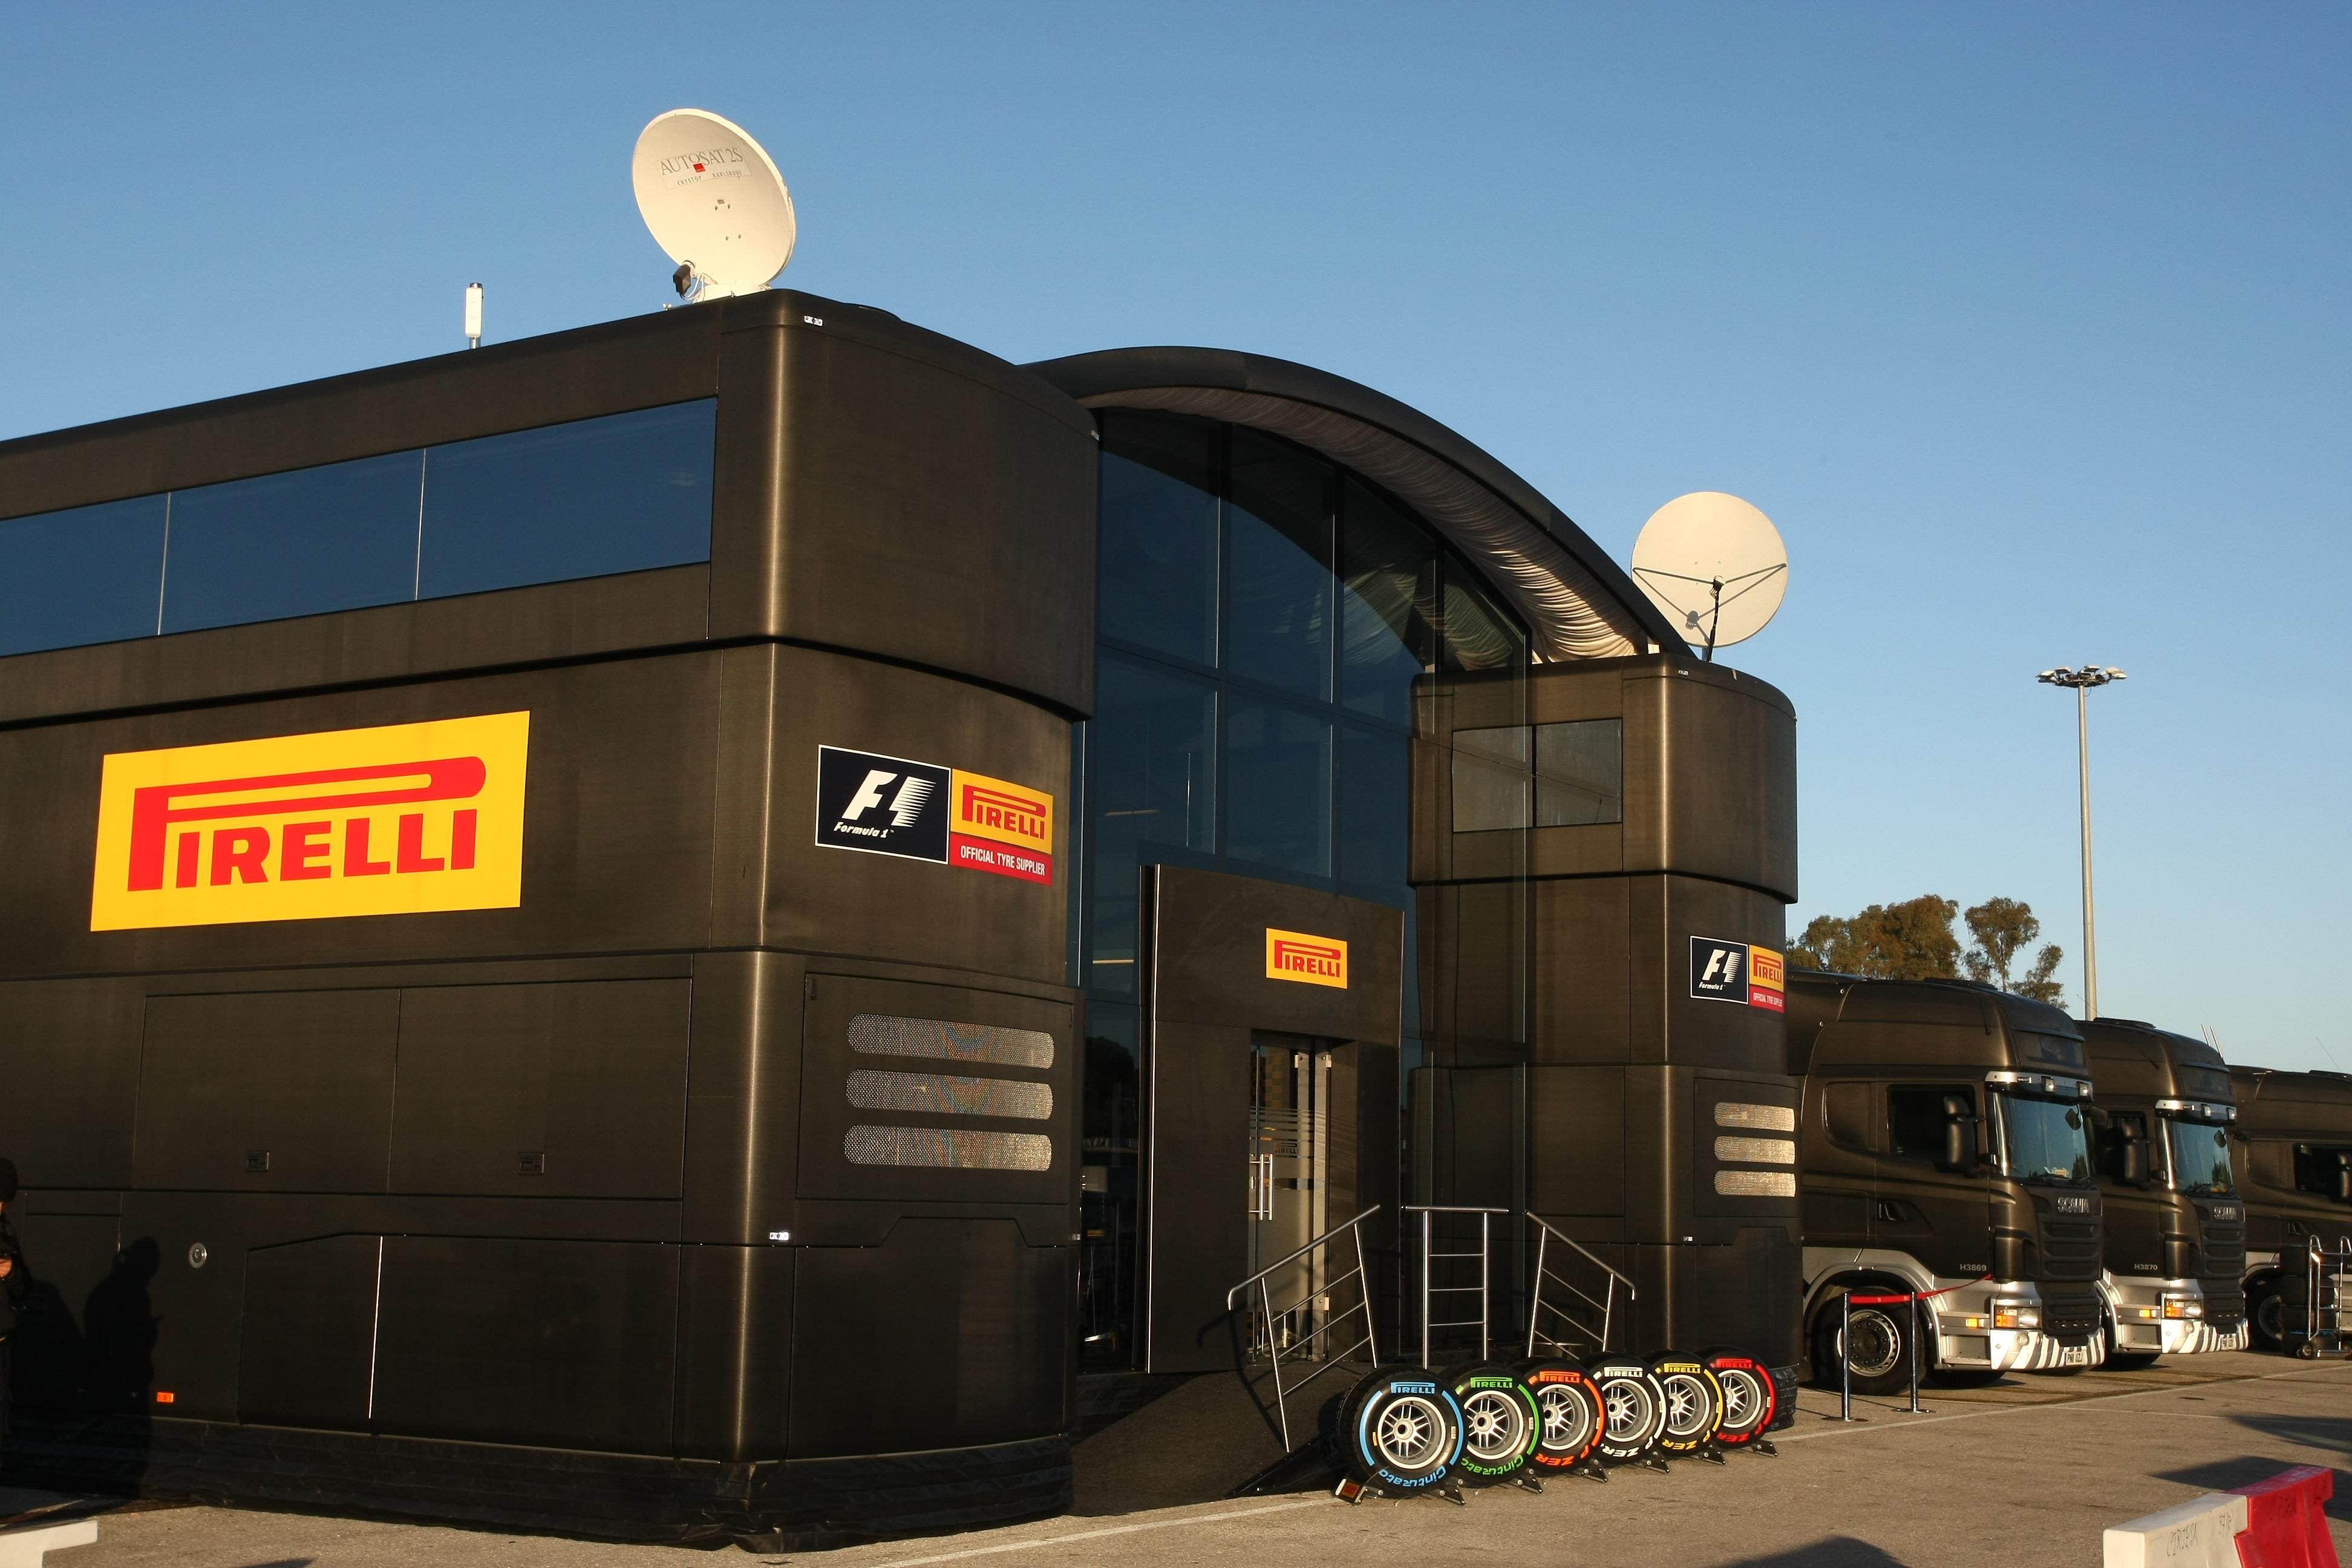 Pirelli F1 motorhome